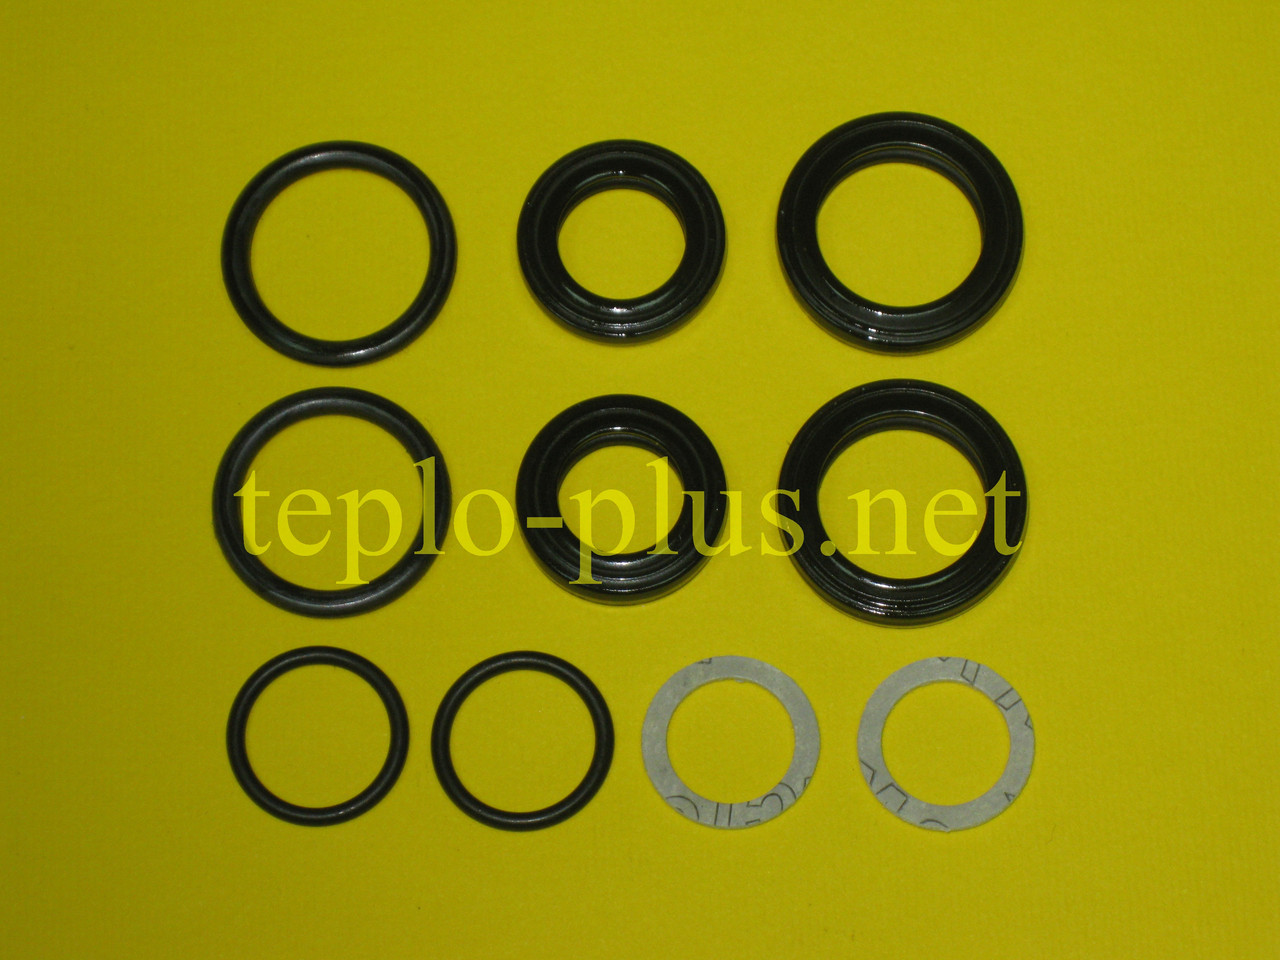 Прокладка 981142, 981163, 981151, 178969 Vaillant ATMOmax, TURBOmax Pro / Plus, atmoTEC Pro / turboTEC Pro